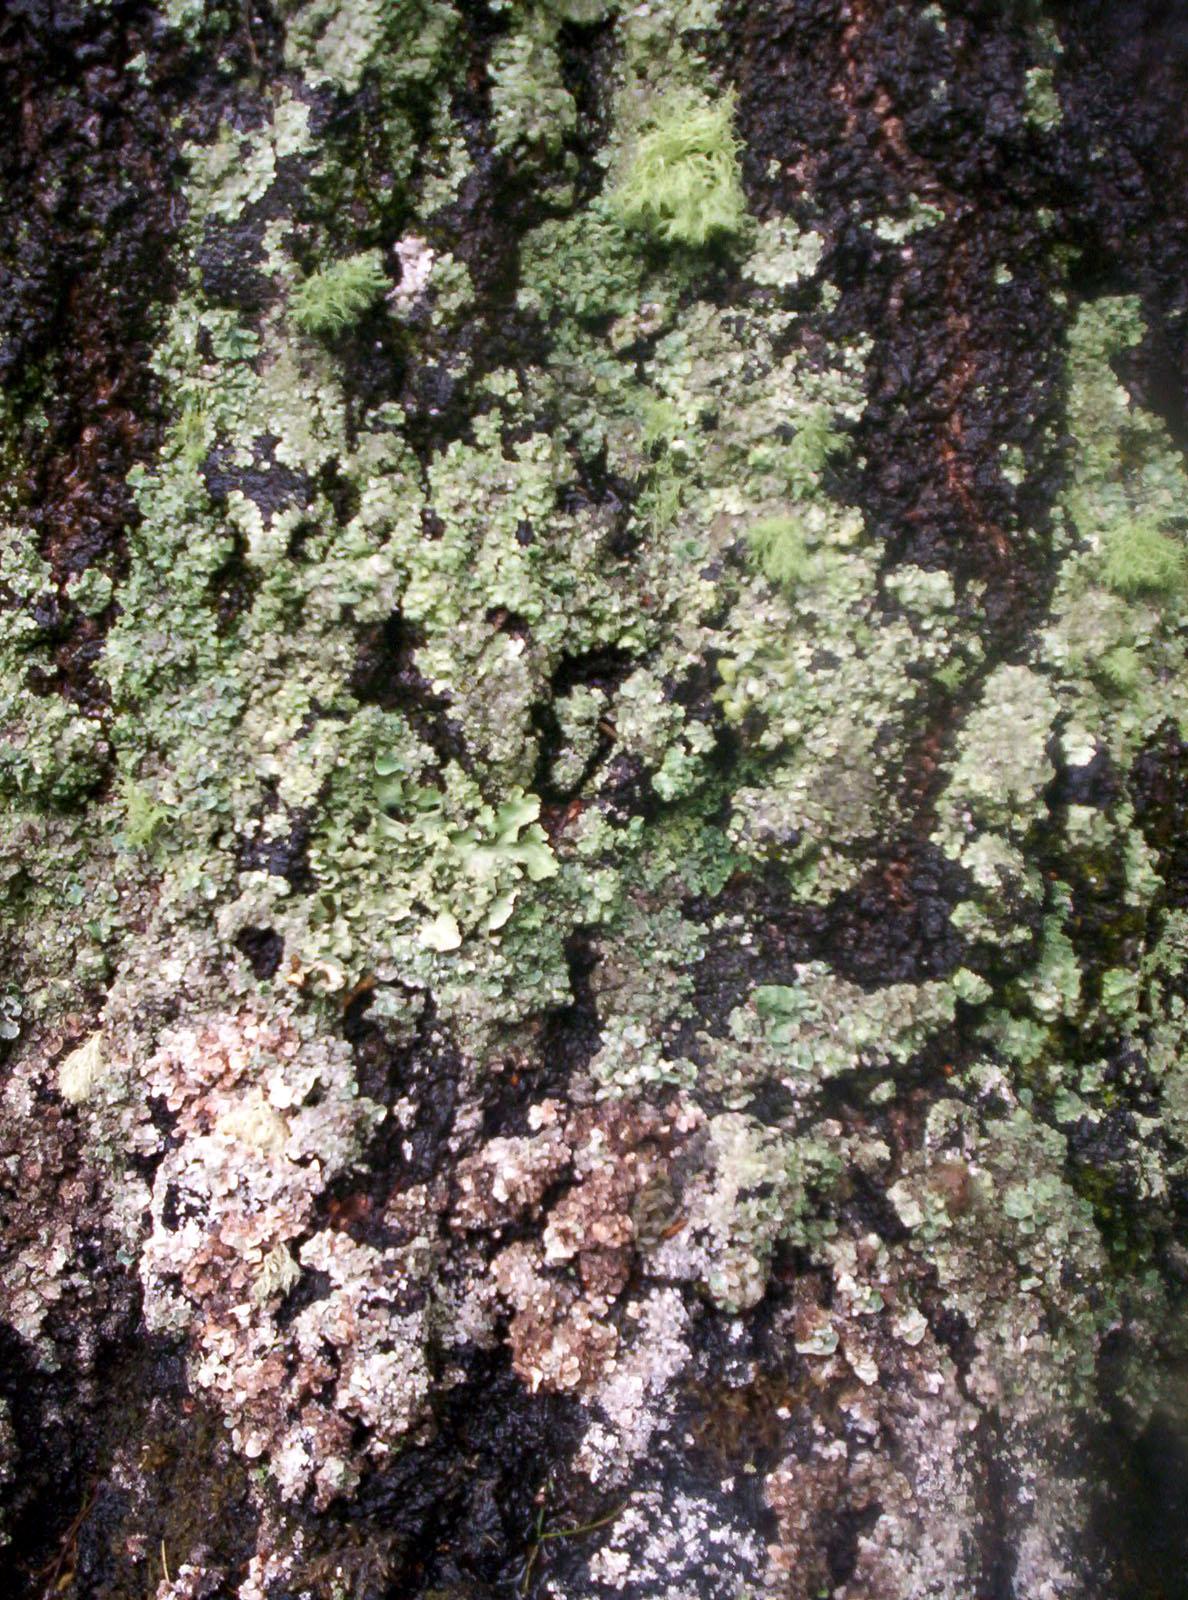 Lichen on West Facing Silver Birch 1, Bspo06, Horticulture, Rough, Stone, HQ Photo